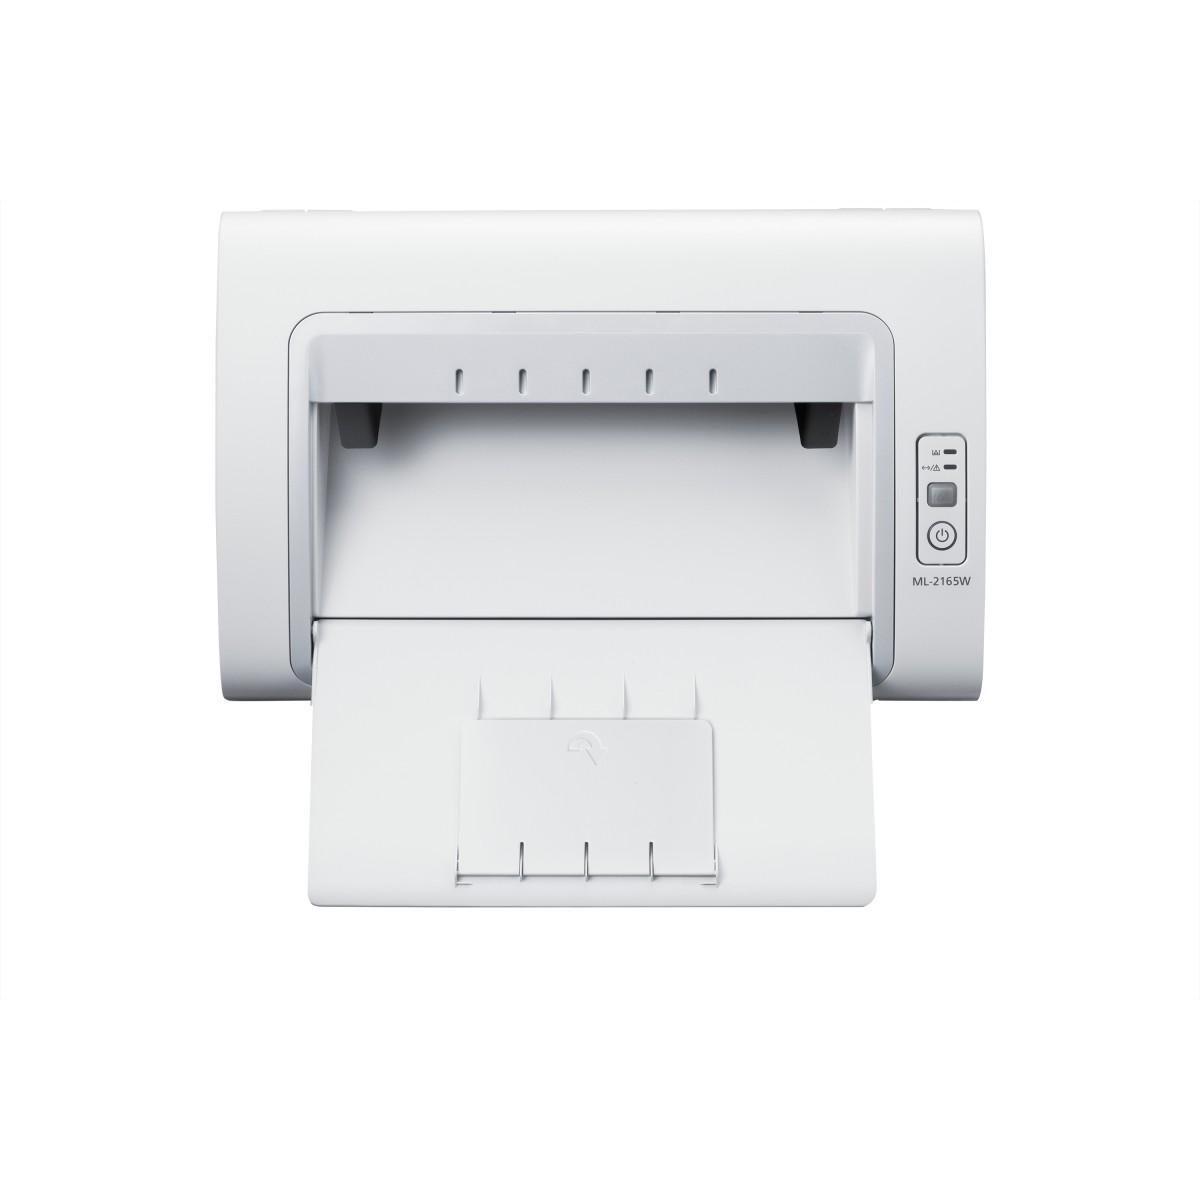 Impressora Laser Samsung Monocromática Wireless ML-2165W Resolução 1200x1200 dpi 20ppm 10000 Pag/Mês USB Branca  - ShopNoroeste.com.br